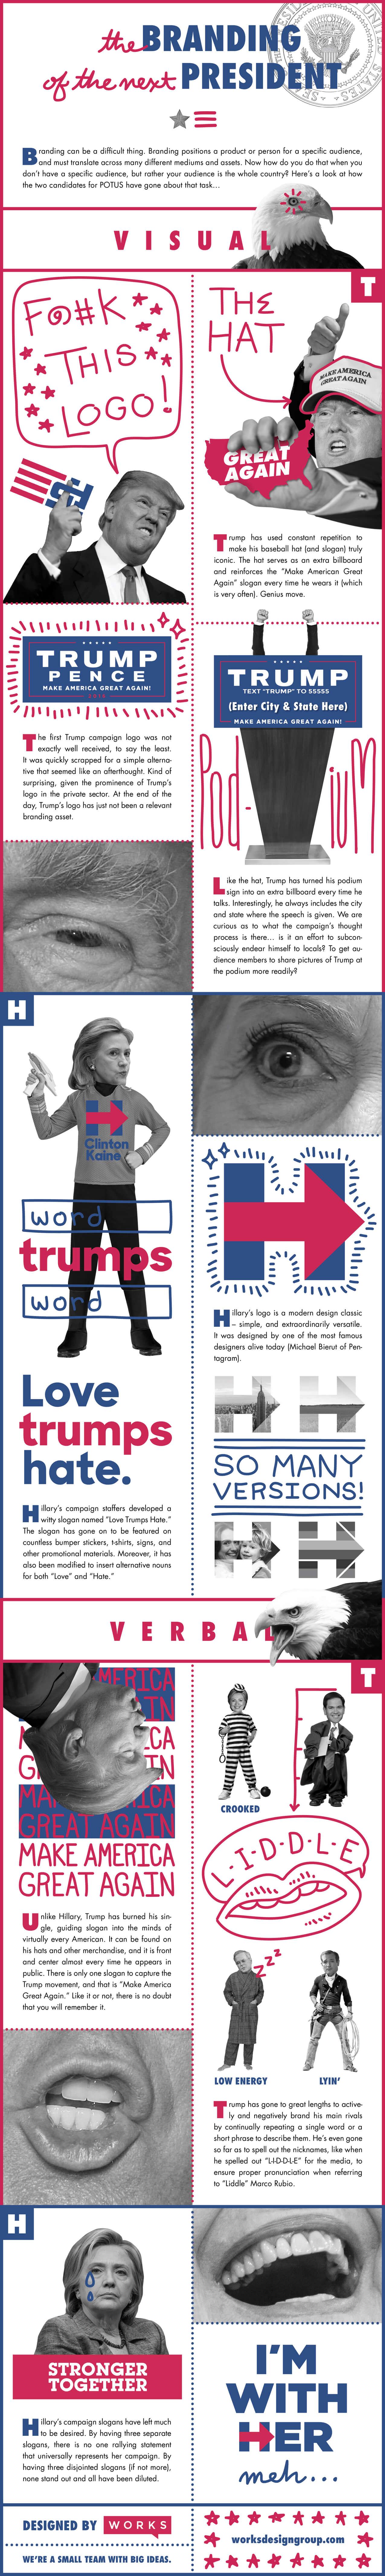 Presidential-branding-infographic-plaza